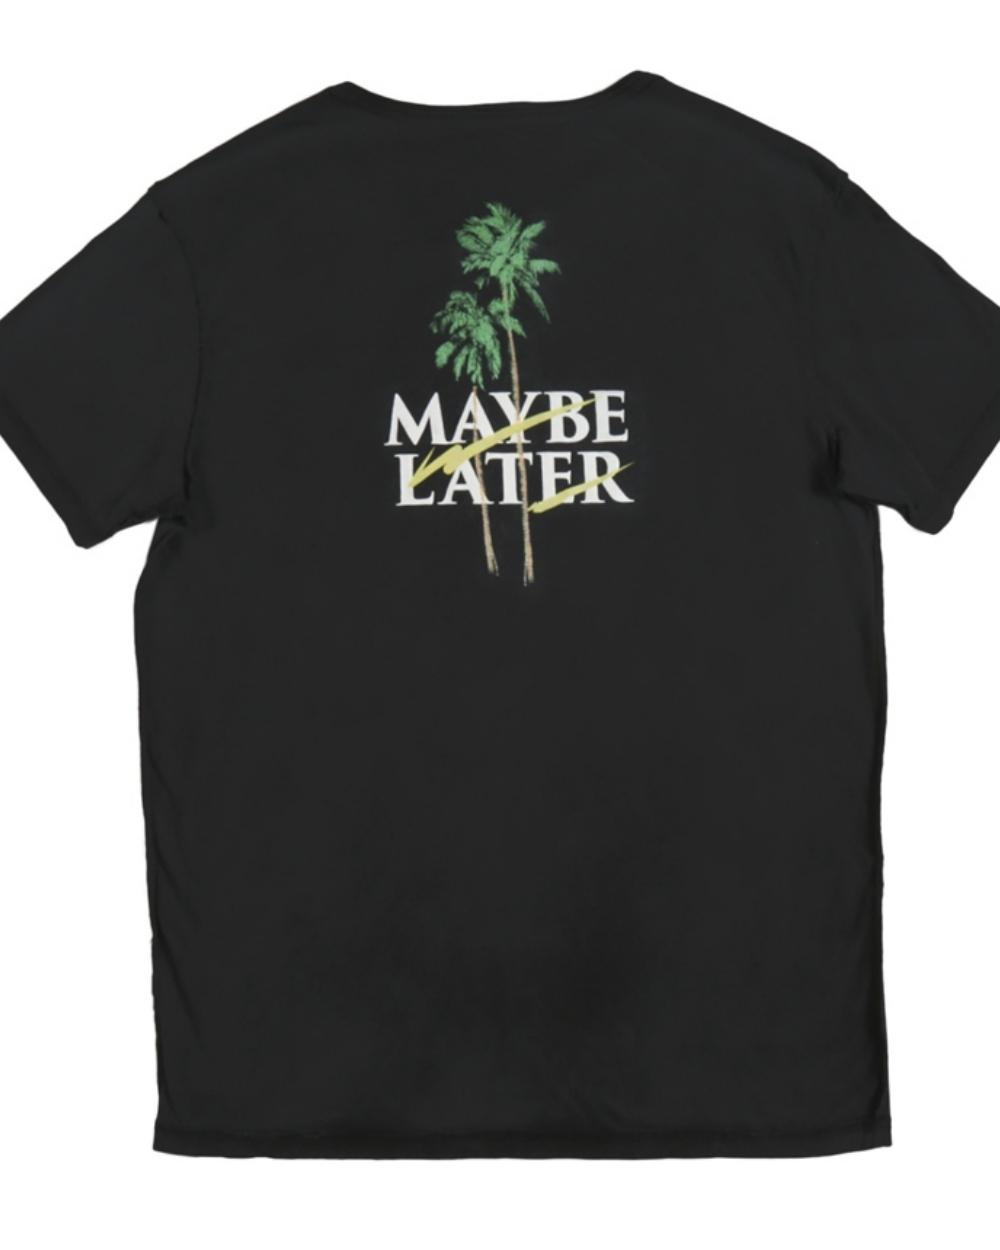 2015 Tavik Men's Black Maybe Later T-Shirt - Back